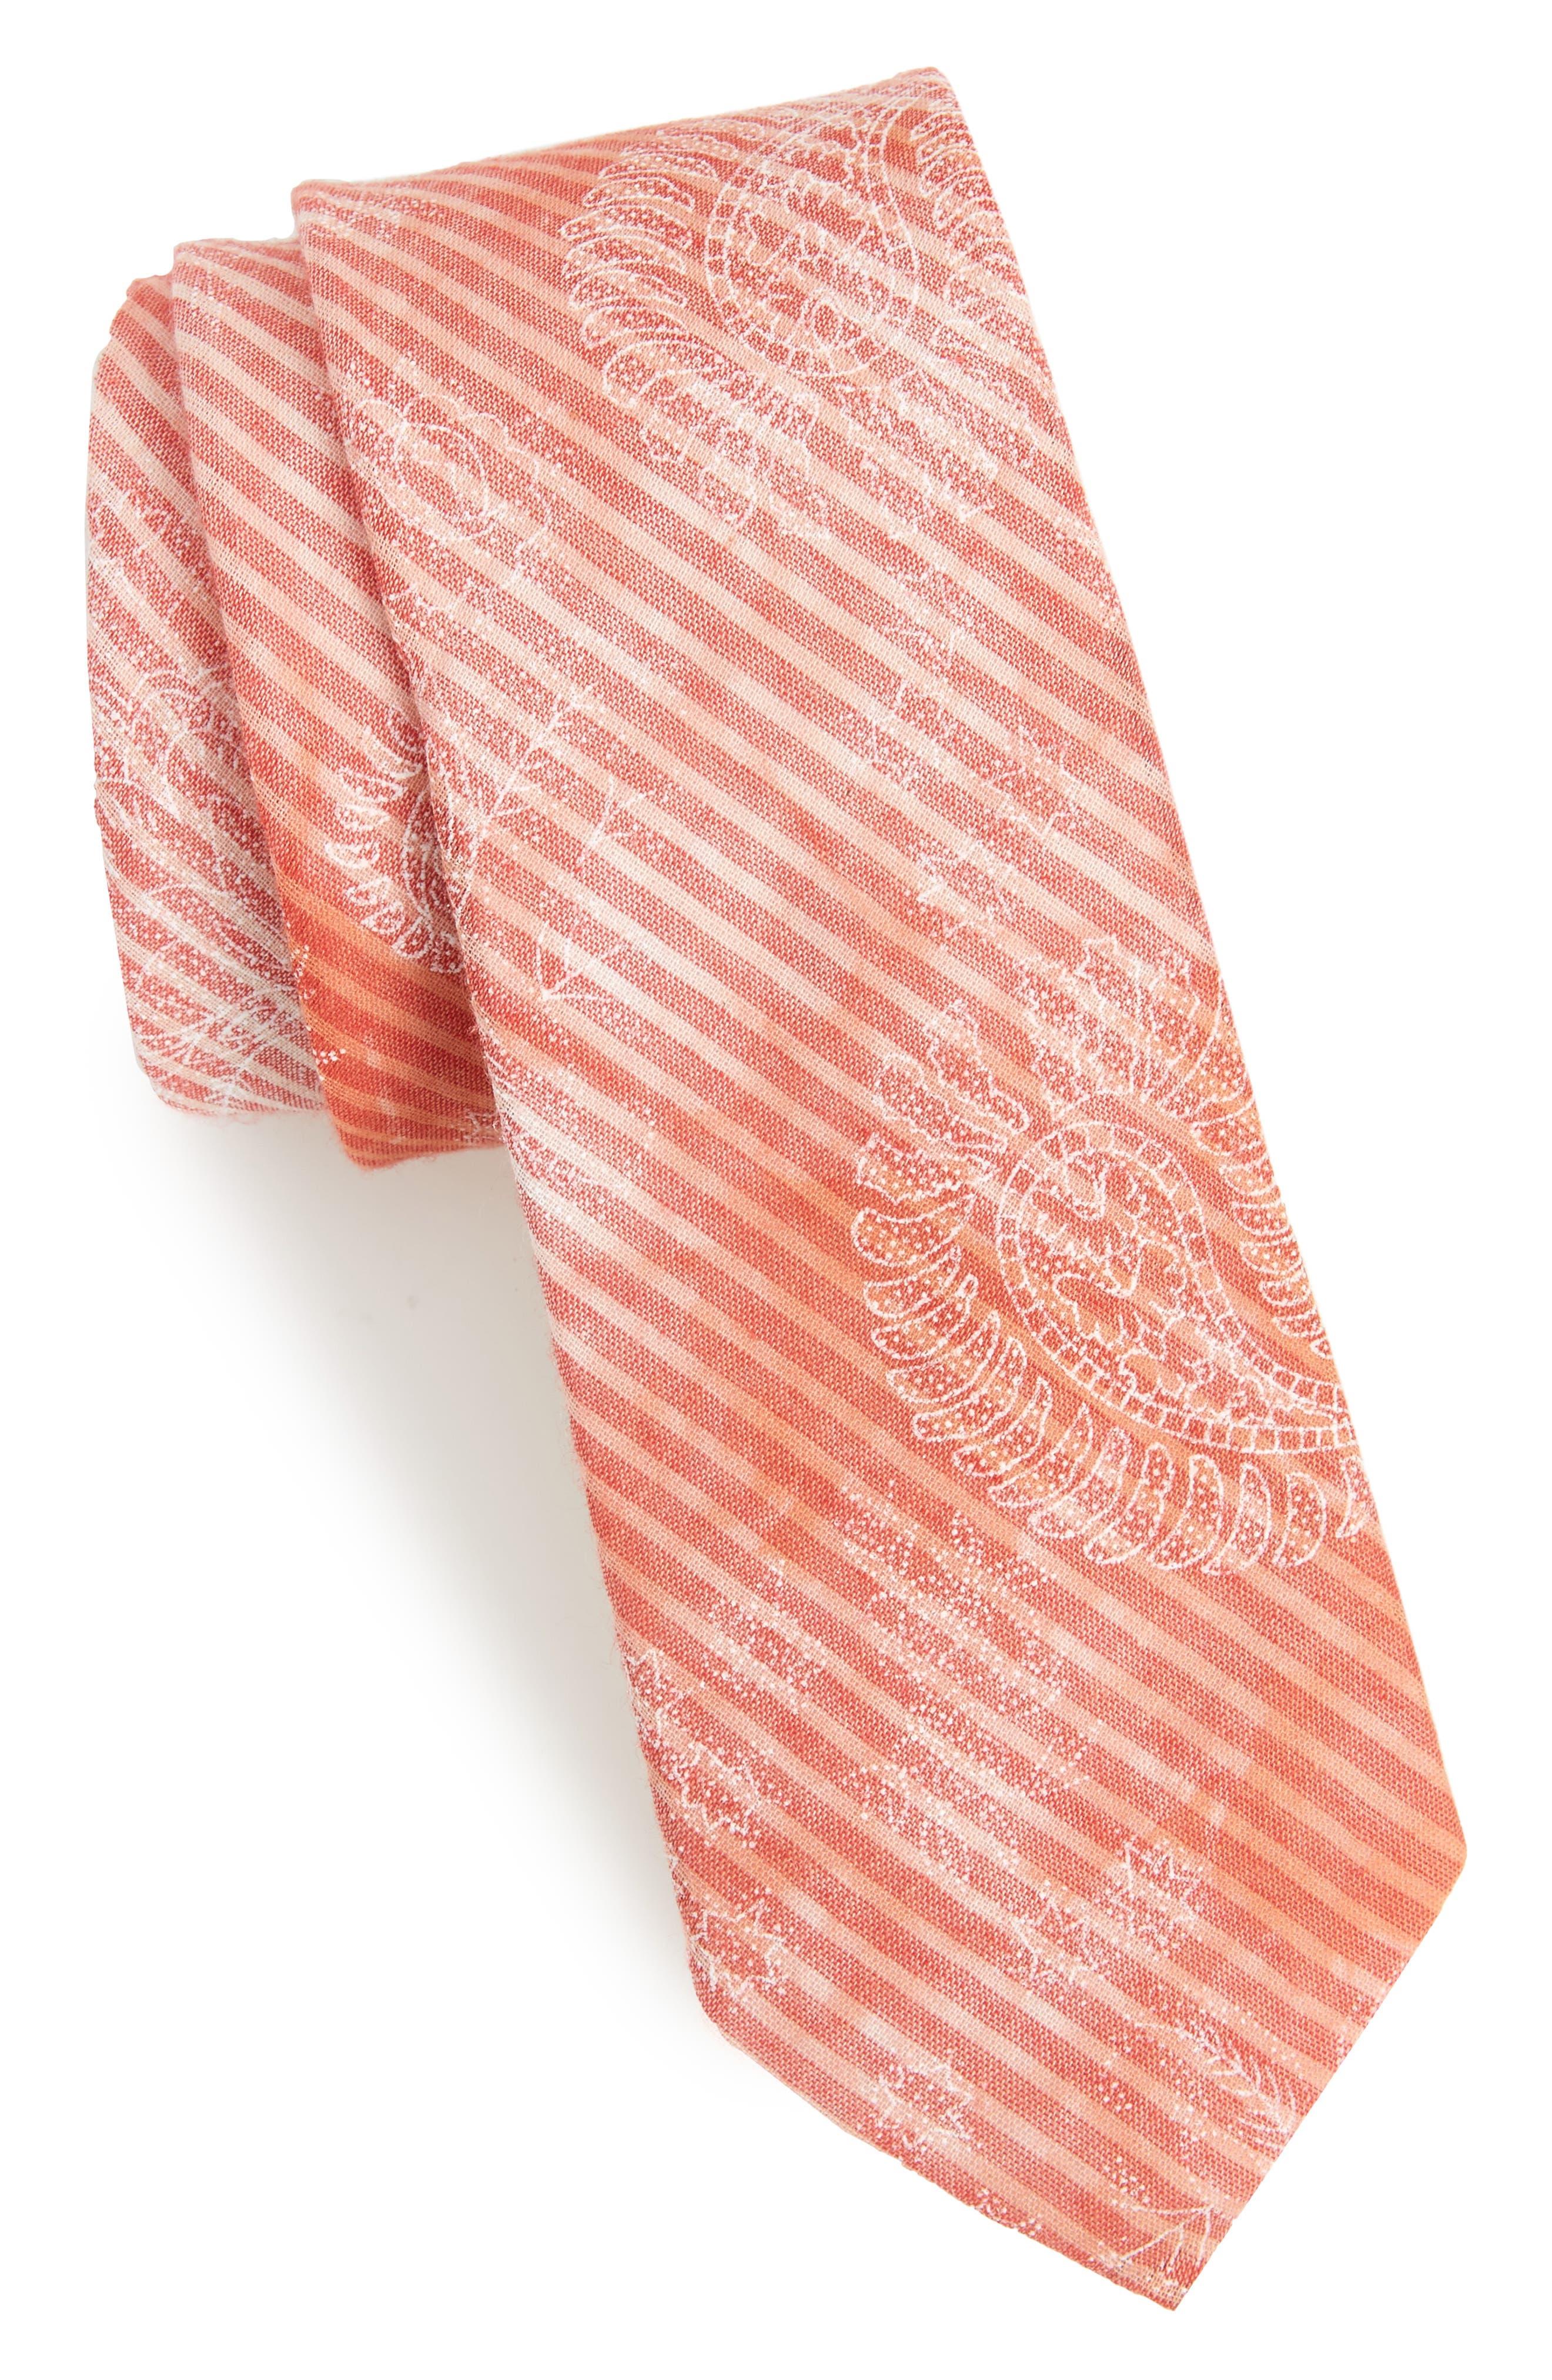 Lee Paisley Cotton Tie,                         Main,                         color, Pink